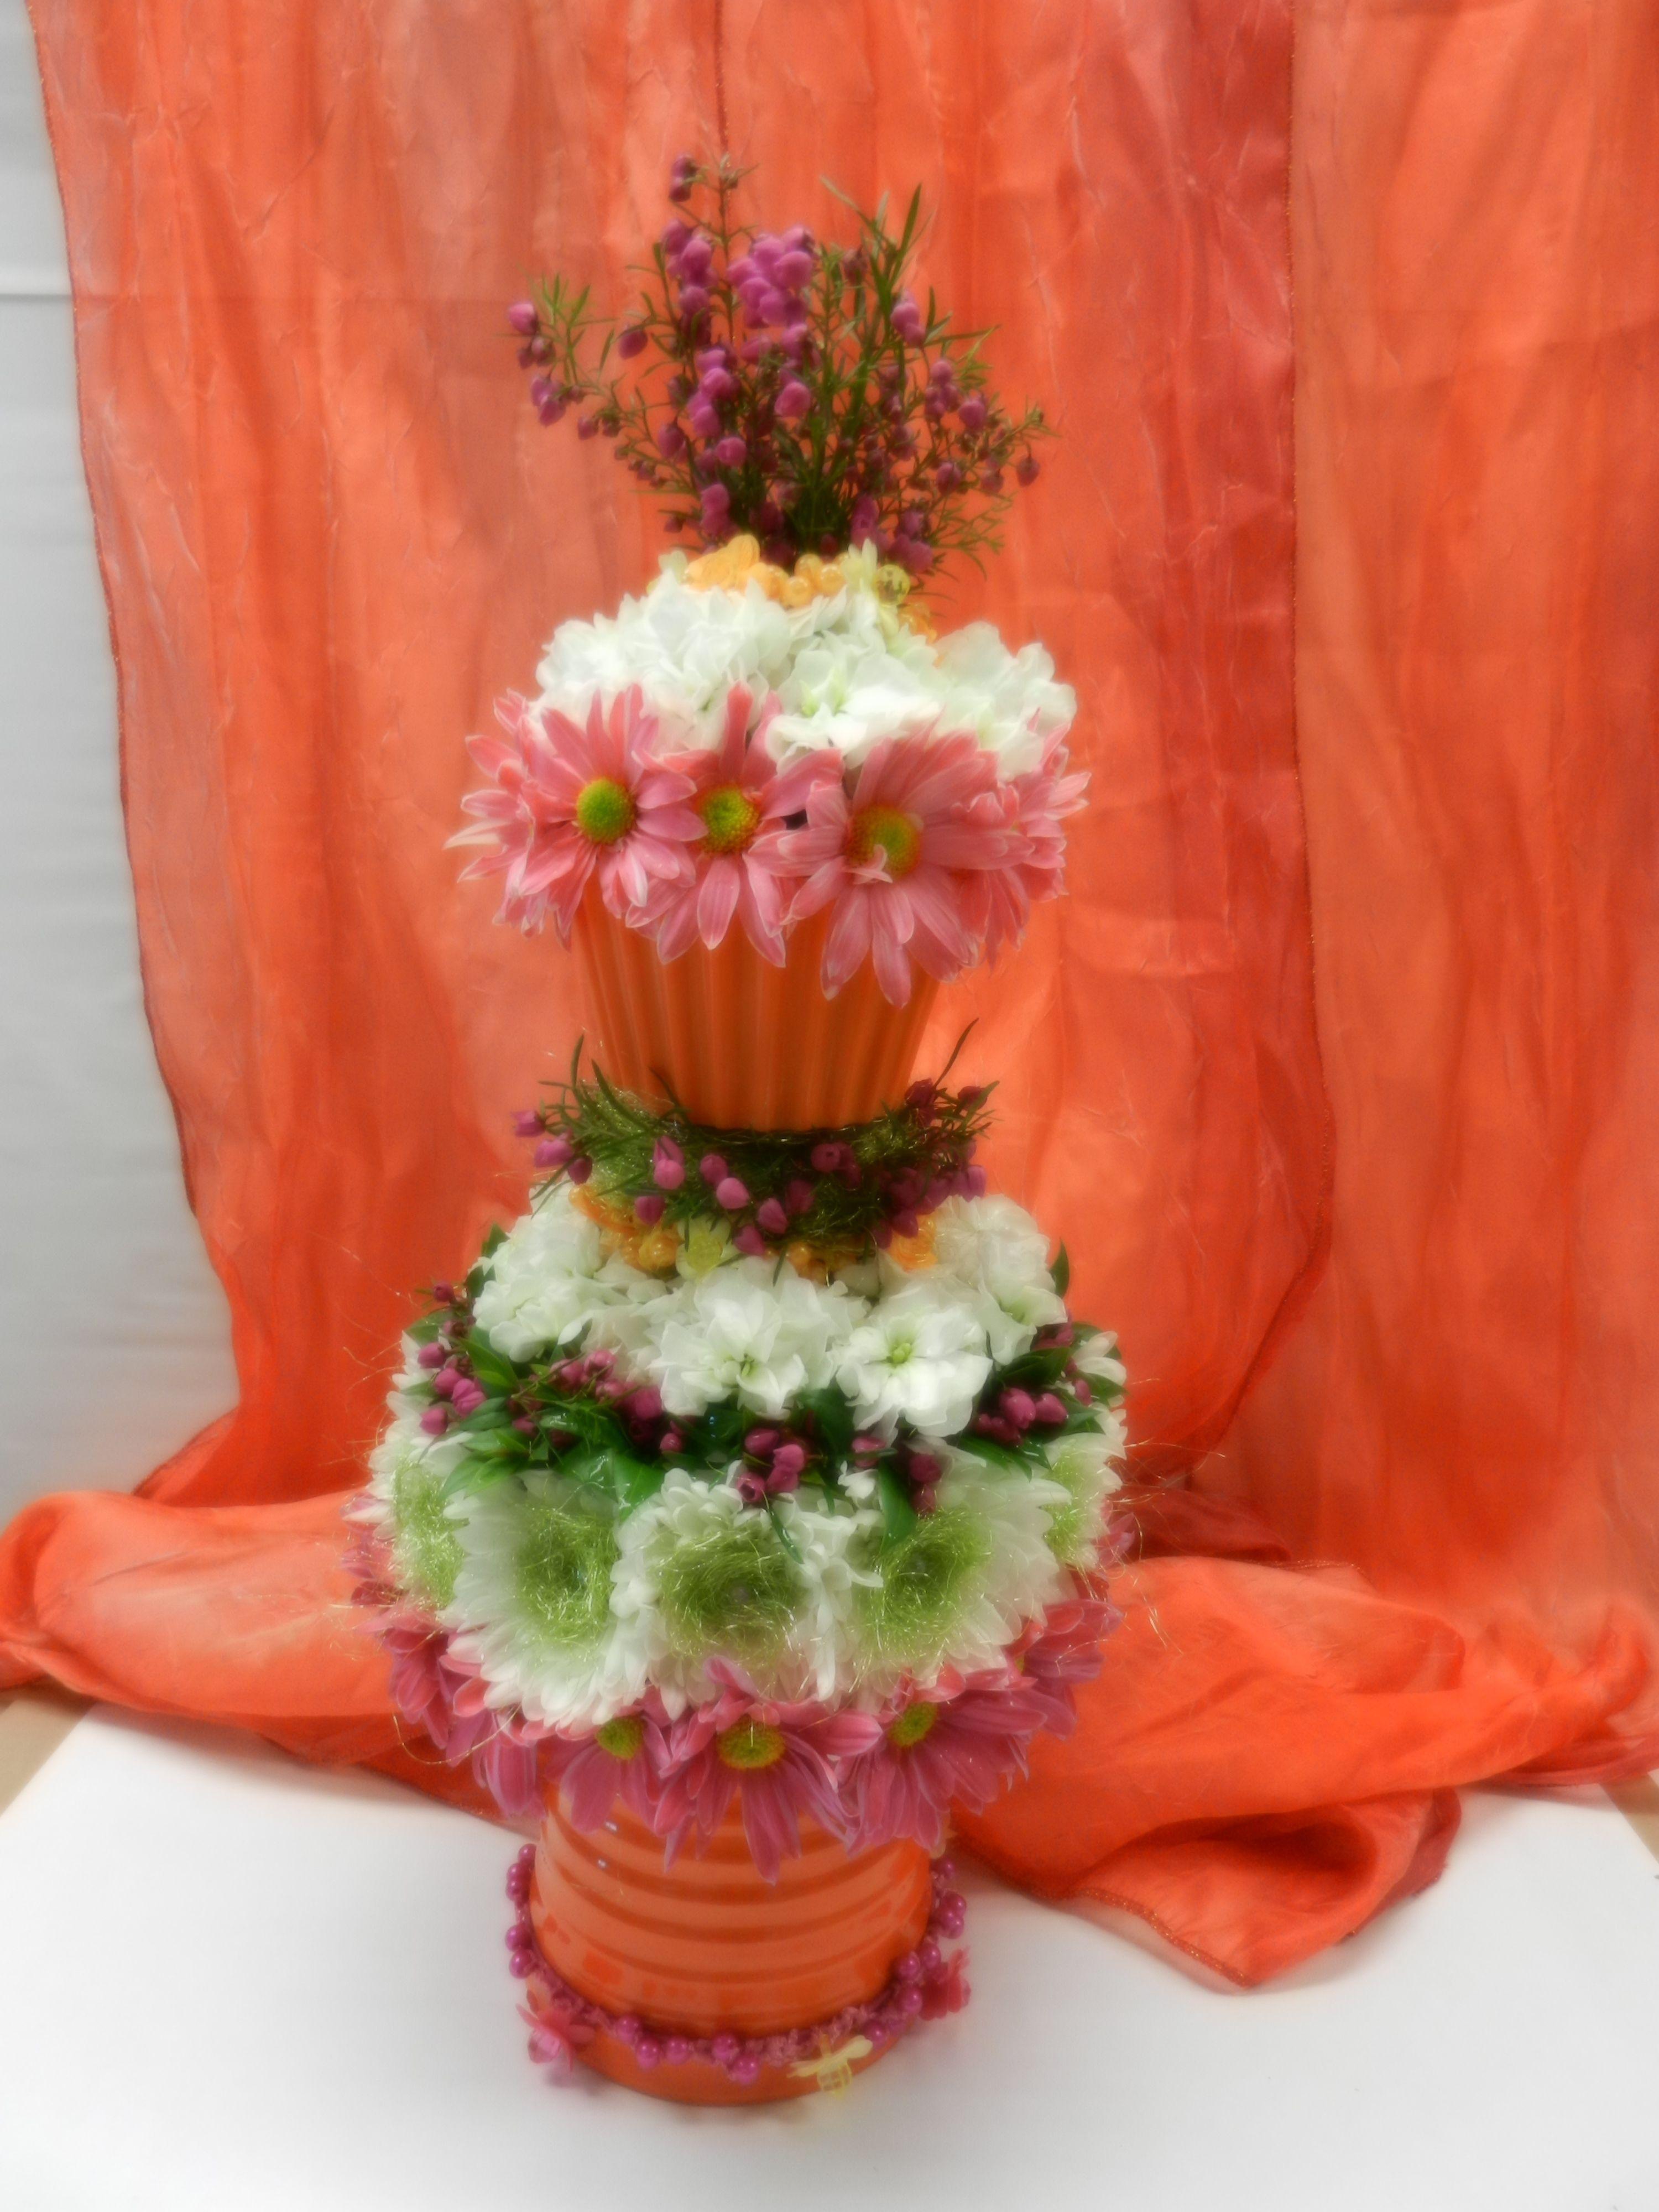 Cake Centerpiece by Zsuzsana for wedding show 3/17/12